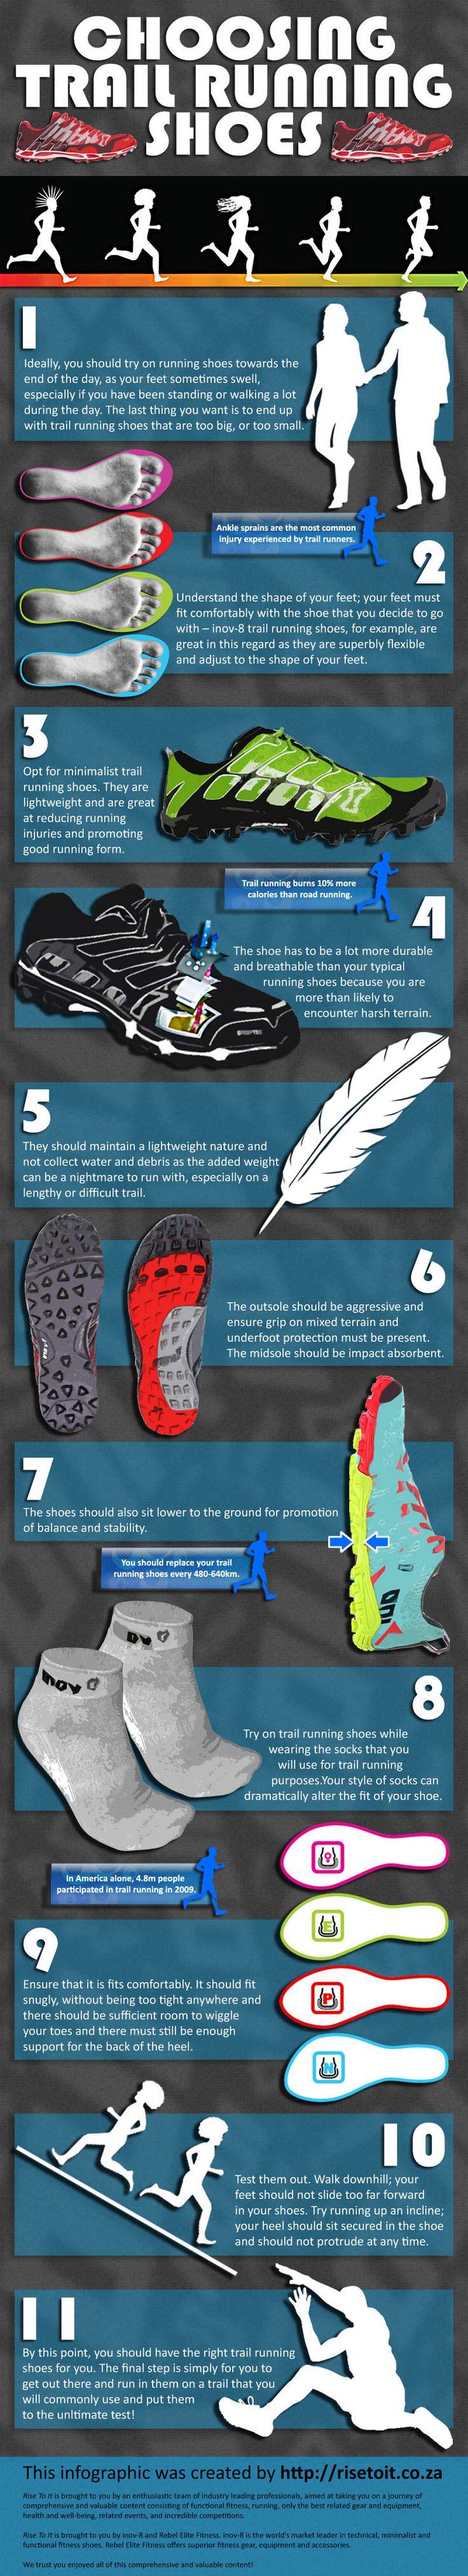 #Sport+#Infographics+-+Choosing+Trail+Running+Shoes+#Infografia